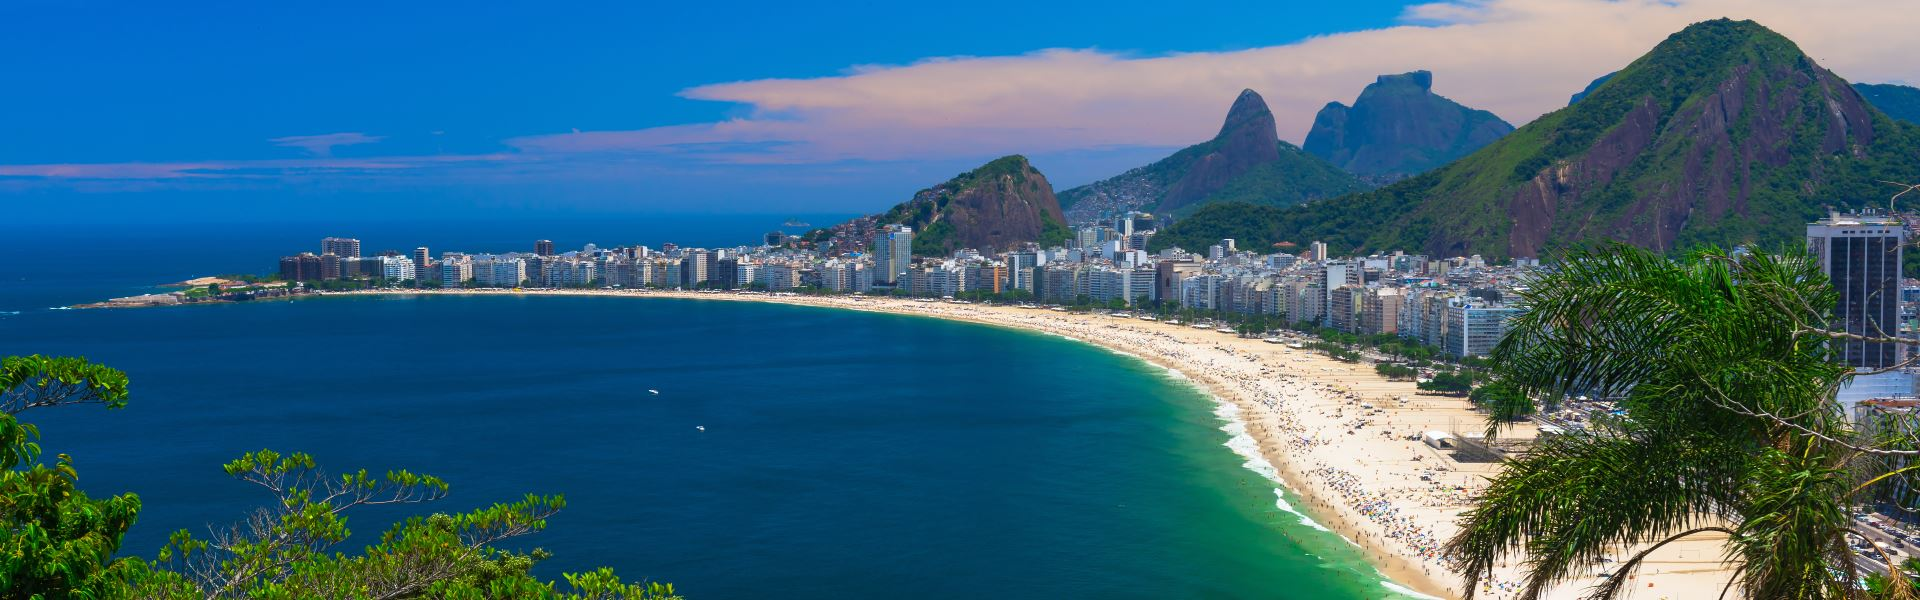 Tours visiting Copacabana Beach, Brazil | Wendy Wu Tours